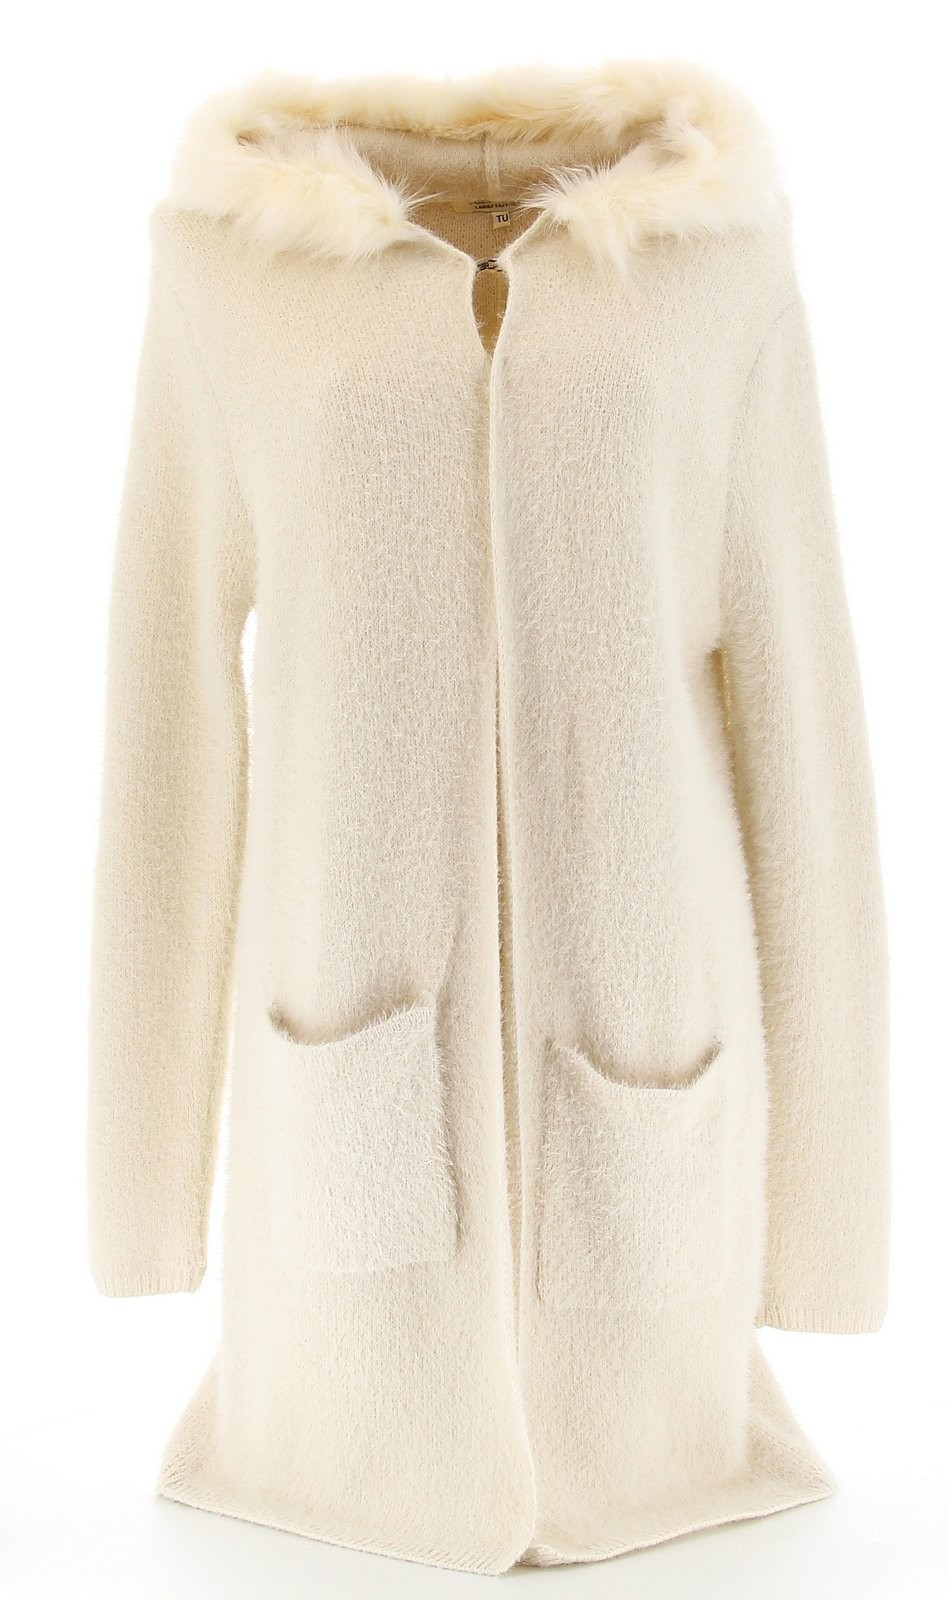 ba5aa06bc276 Gilet laine fourrure femme gilet manteau grosse maille femme